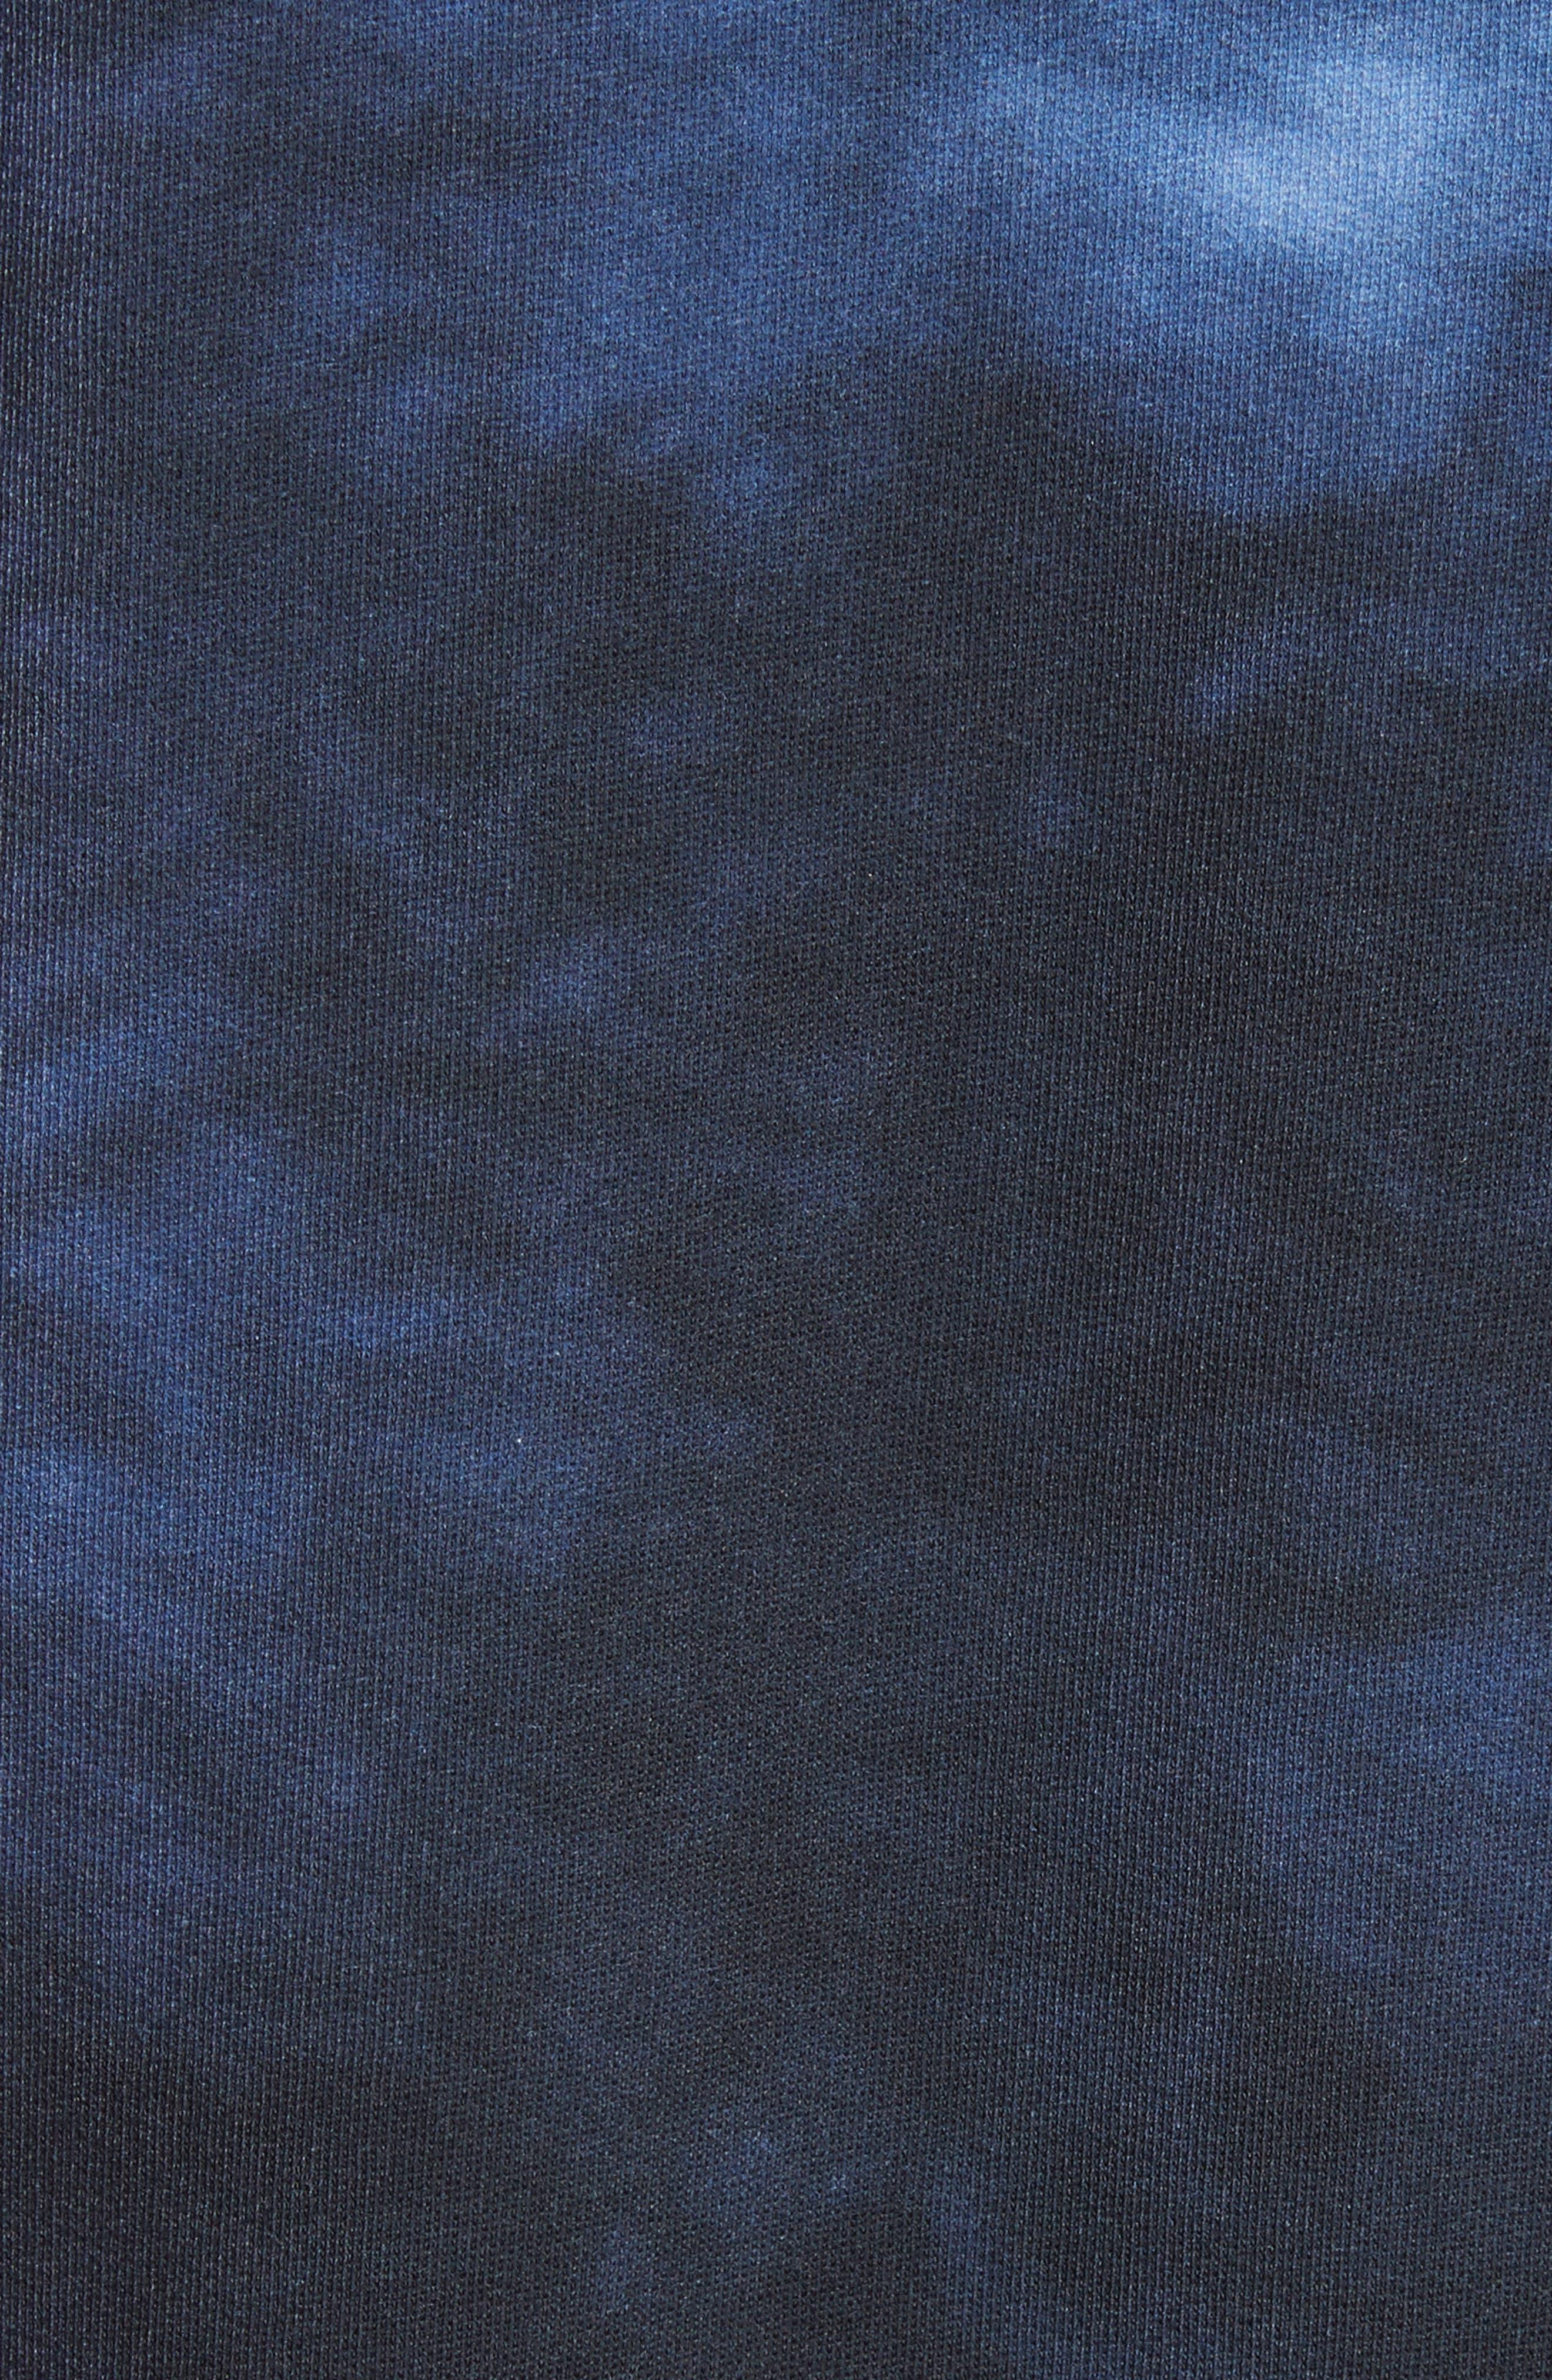 Fellke Bleach Indigo Sweatshirt,                             Alternate thumbnail 5, color,                             410